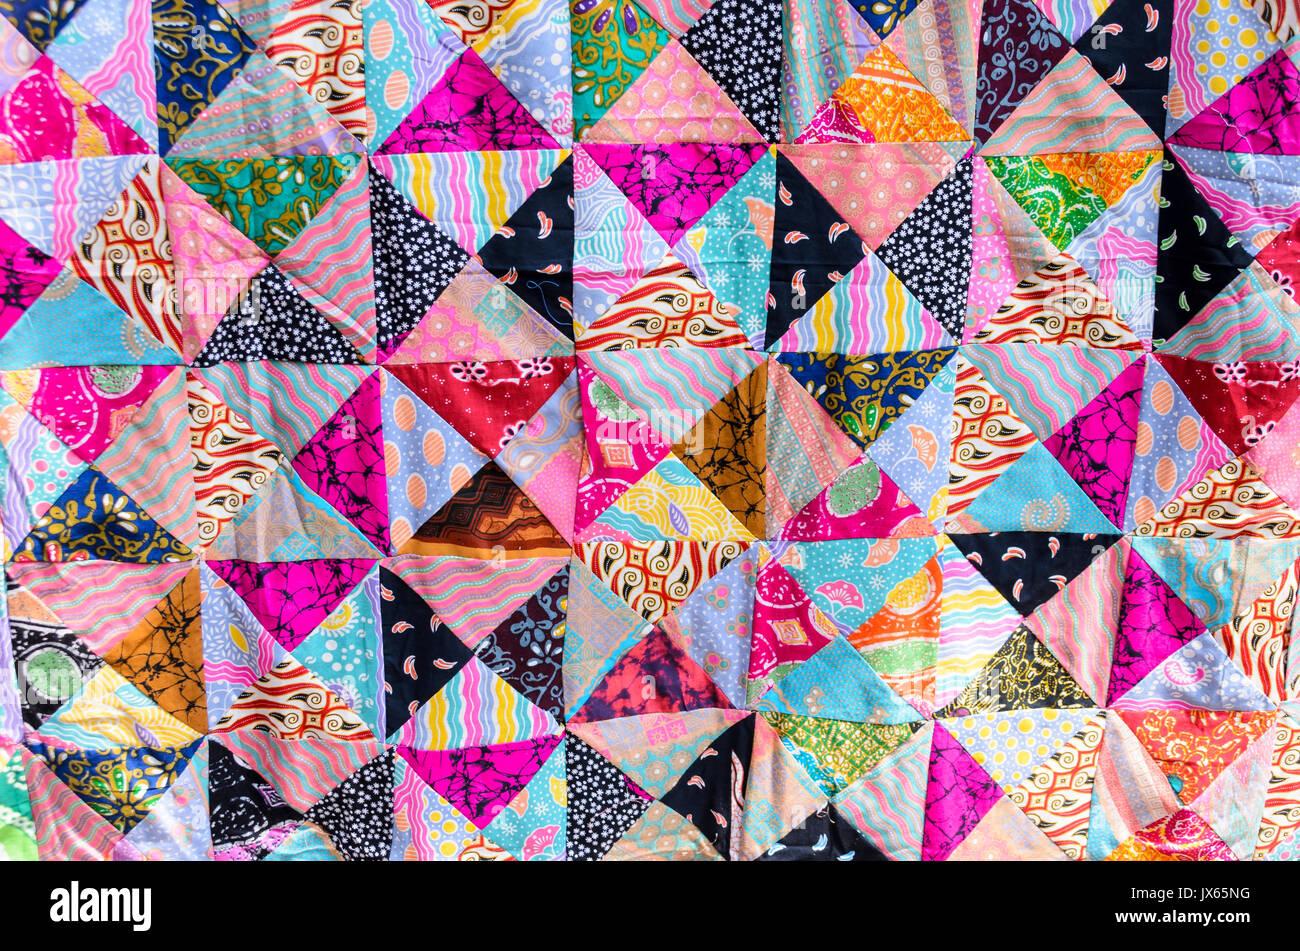 Patchwork quilt on display at the Ubud Art Market, Ubud, Bali - Stock Image